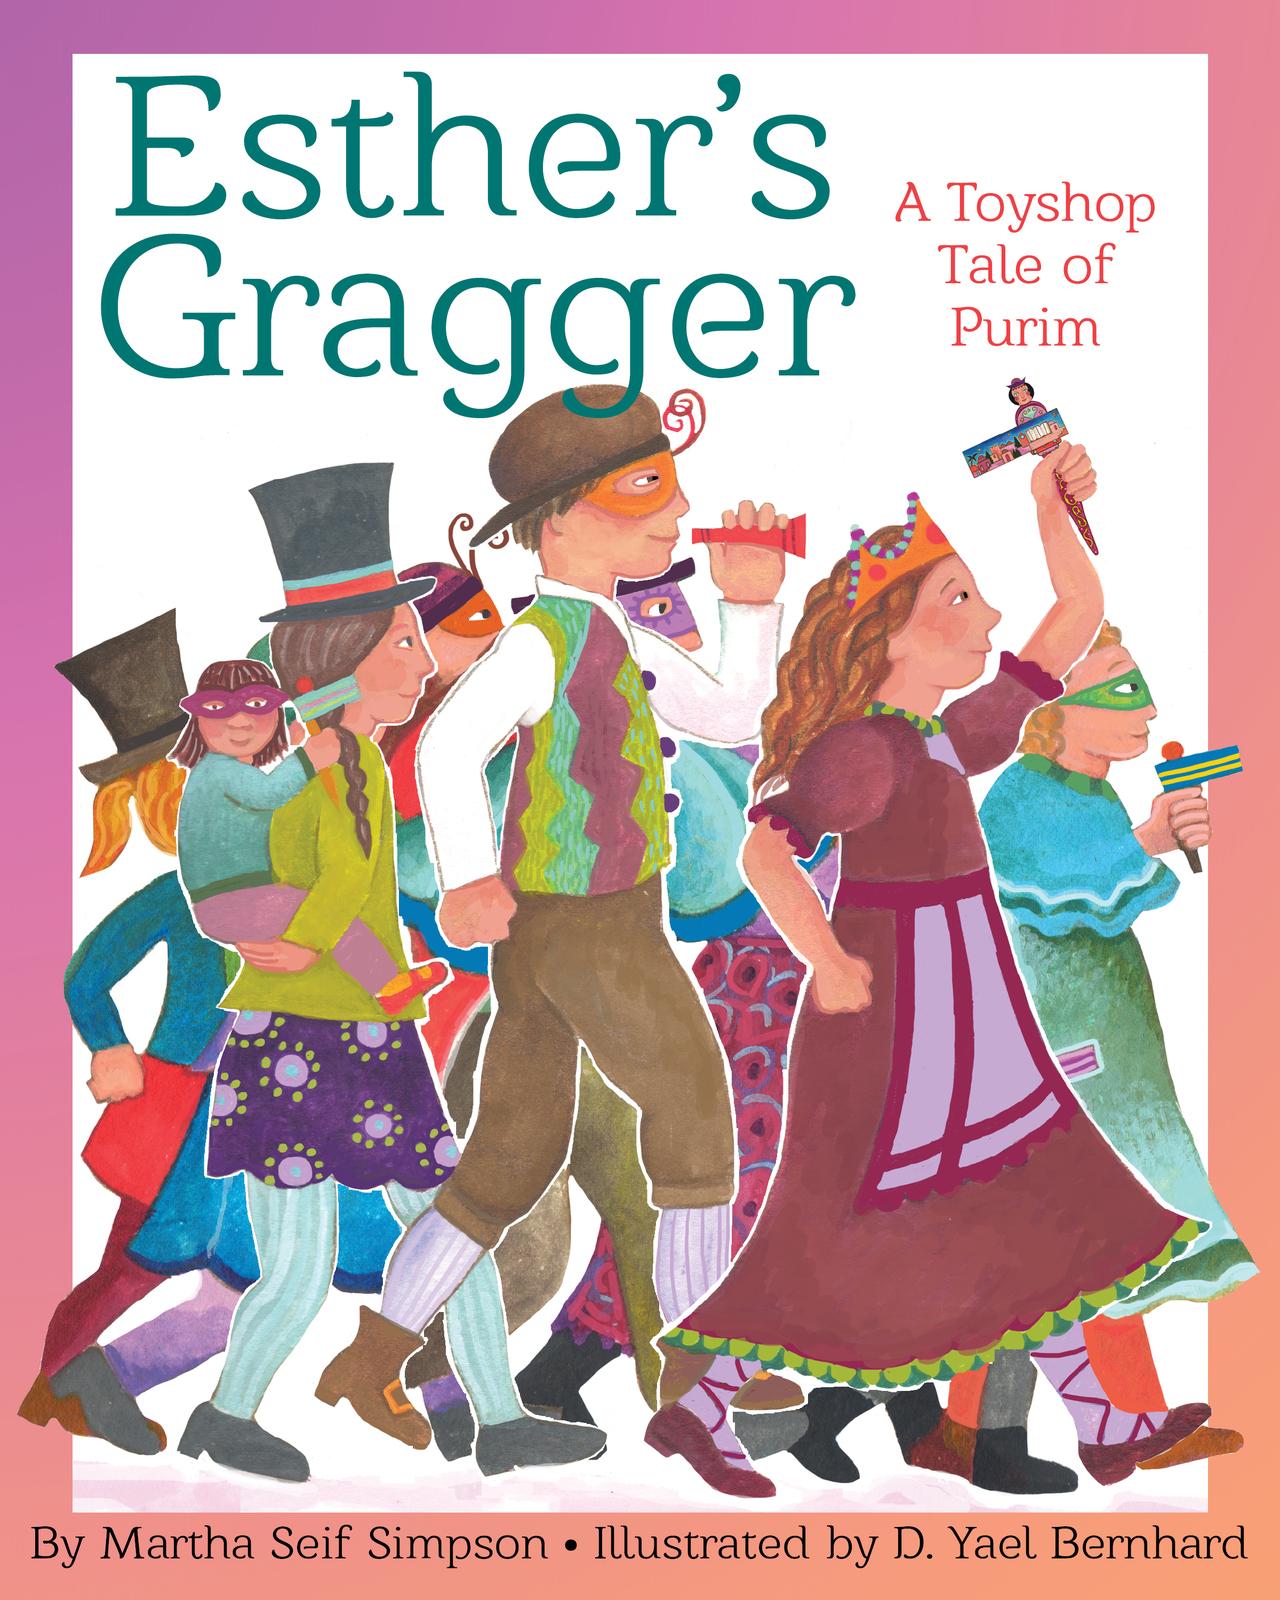 Esther's gragger front cover hi resolution